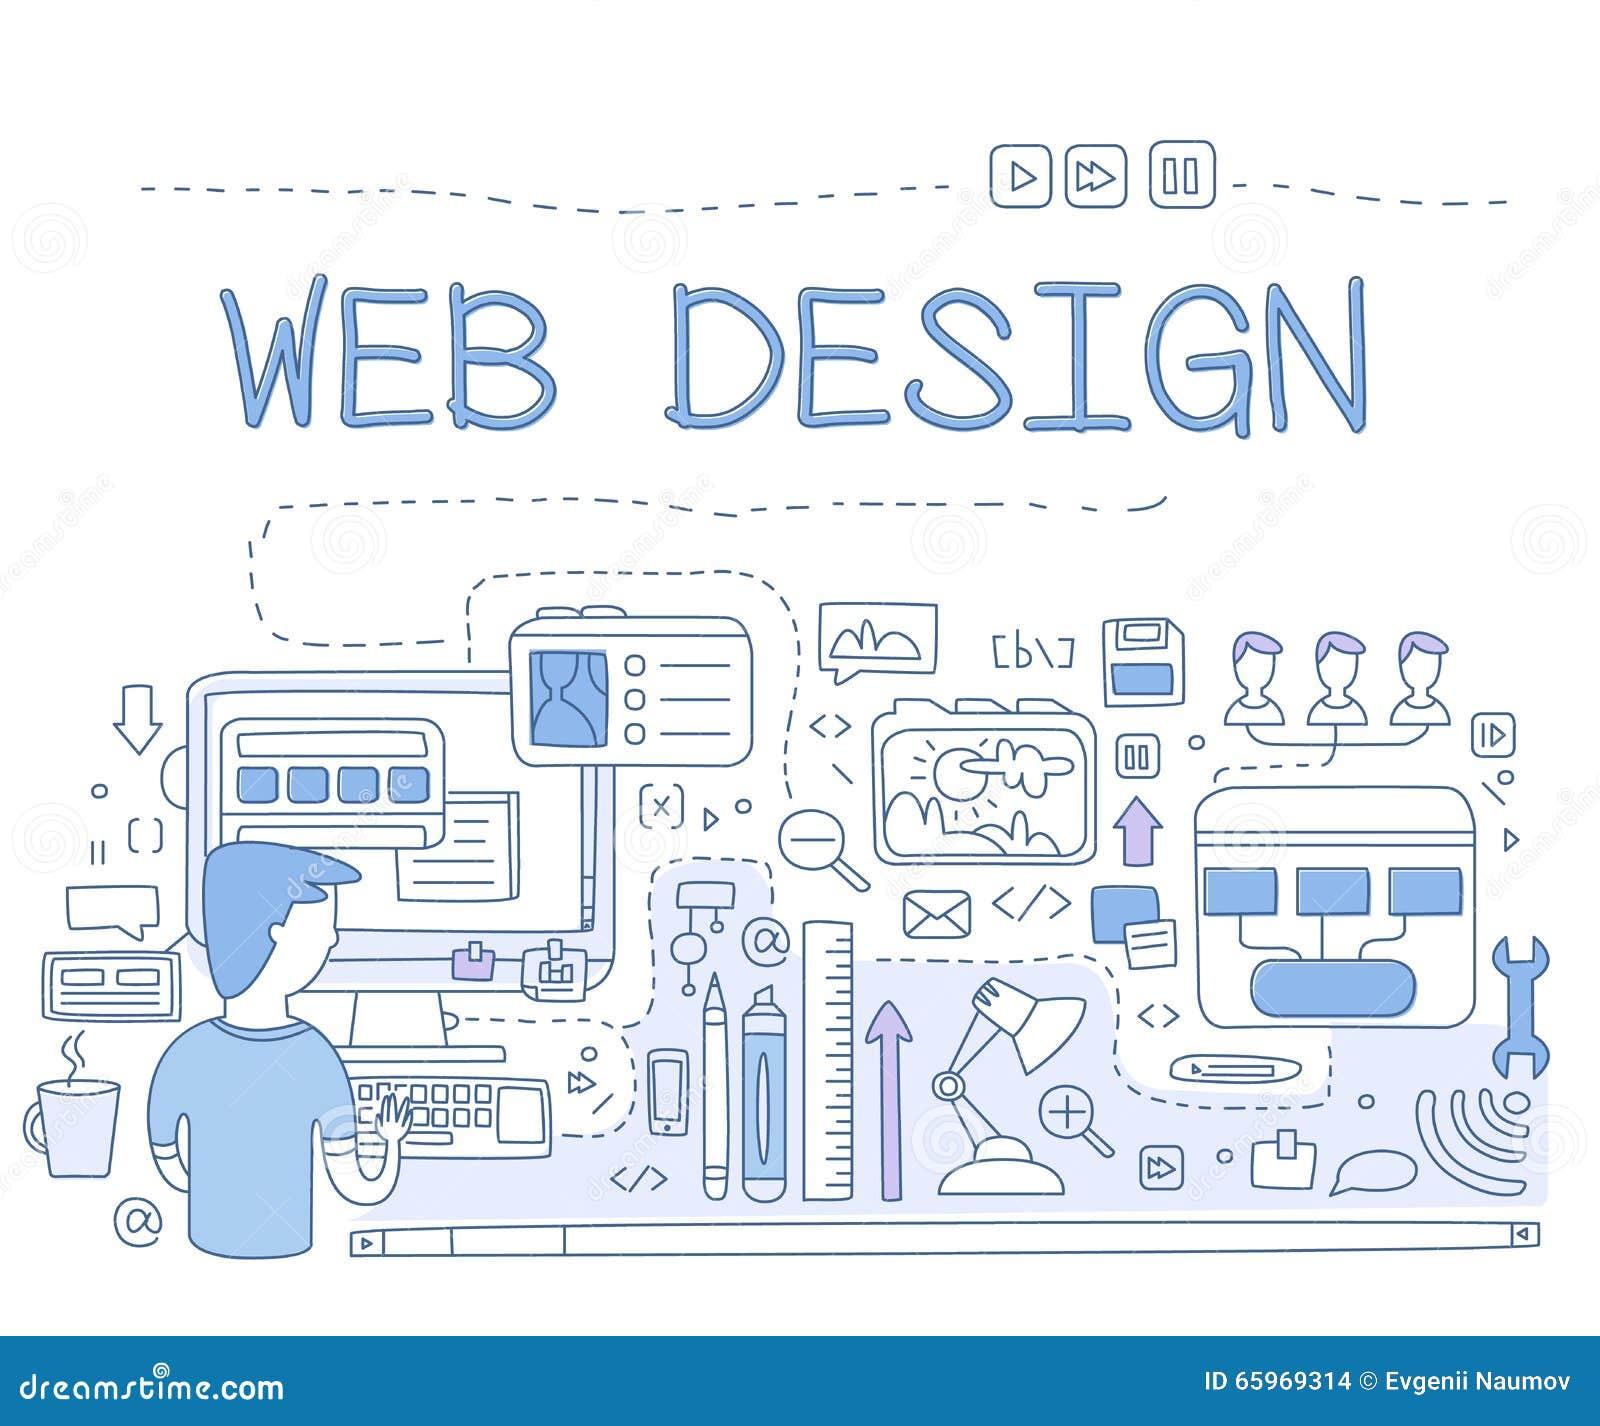 Design Web Design Graphics Pen Tool To Create Ui Mobile